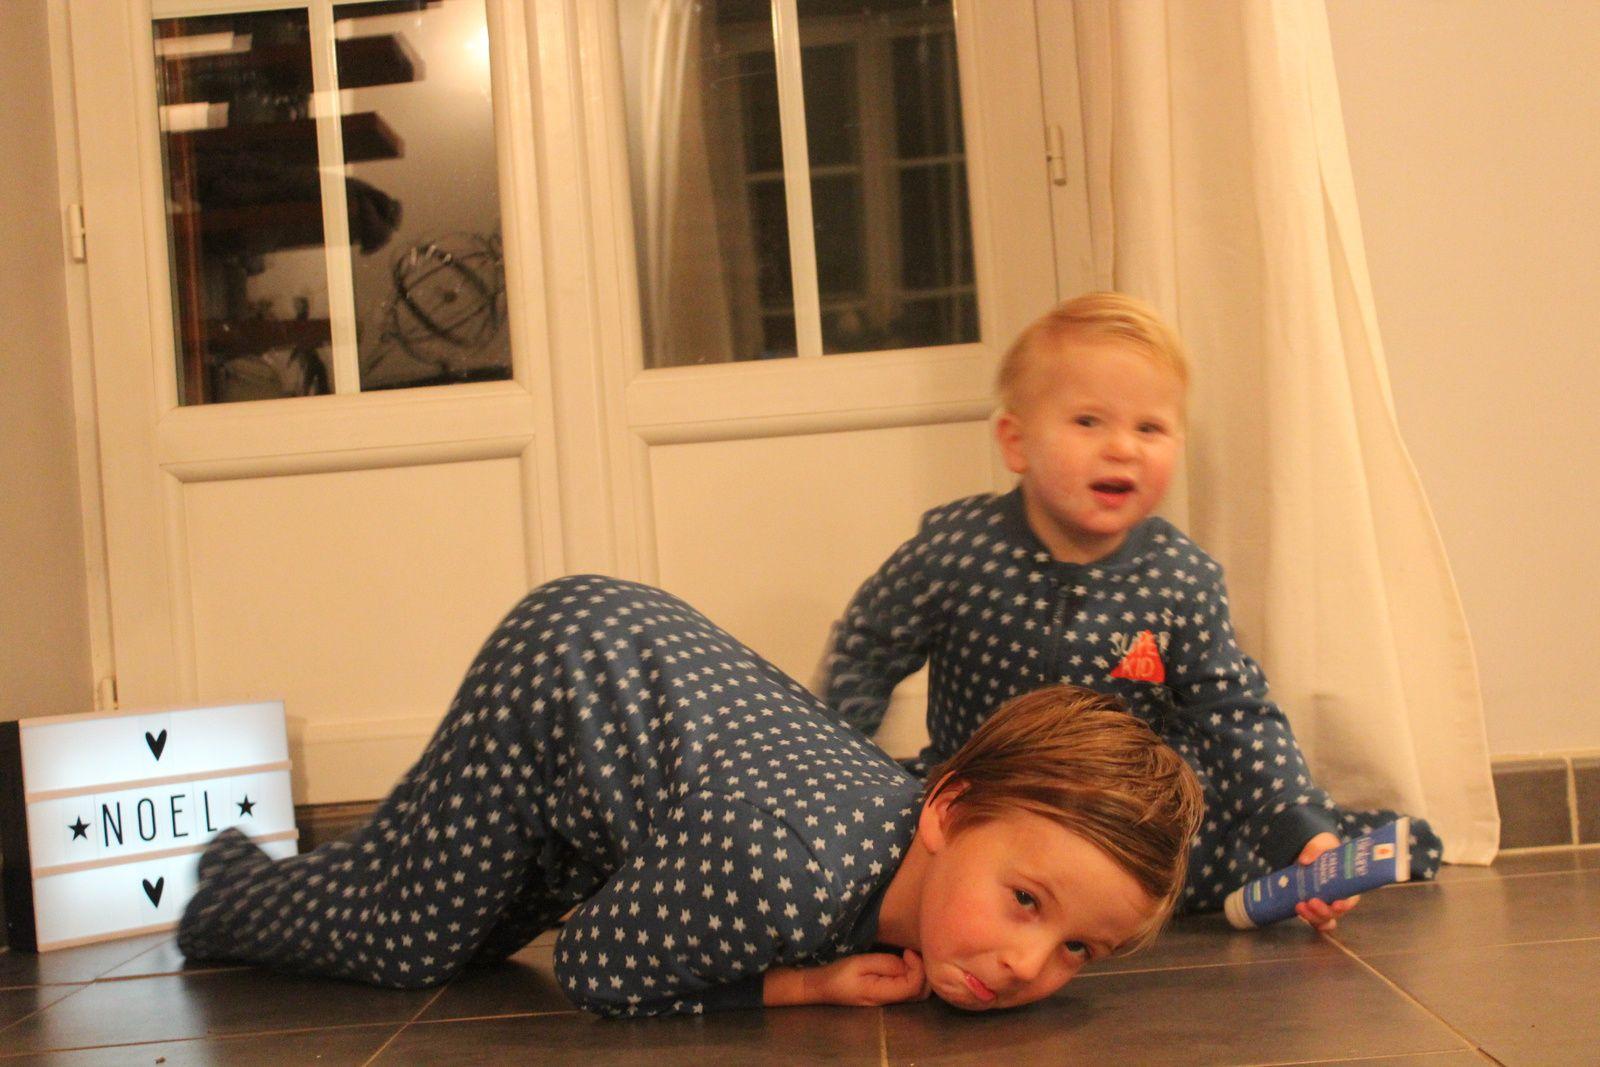 Les garçons portent des pyjamas: vert baudet